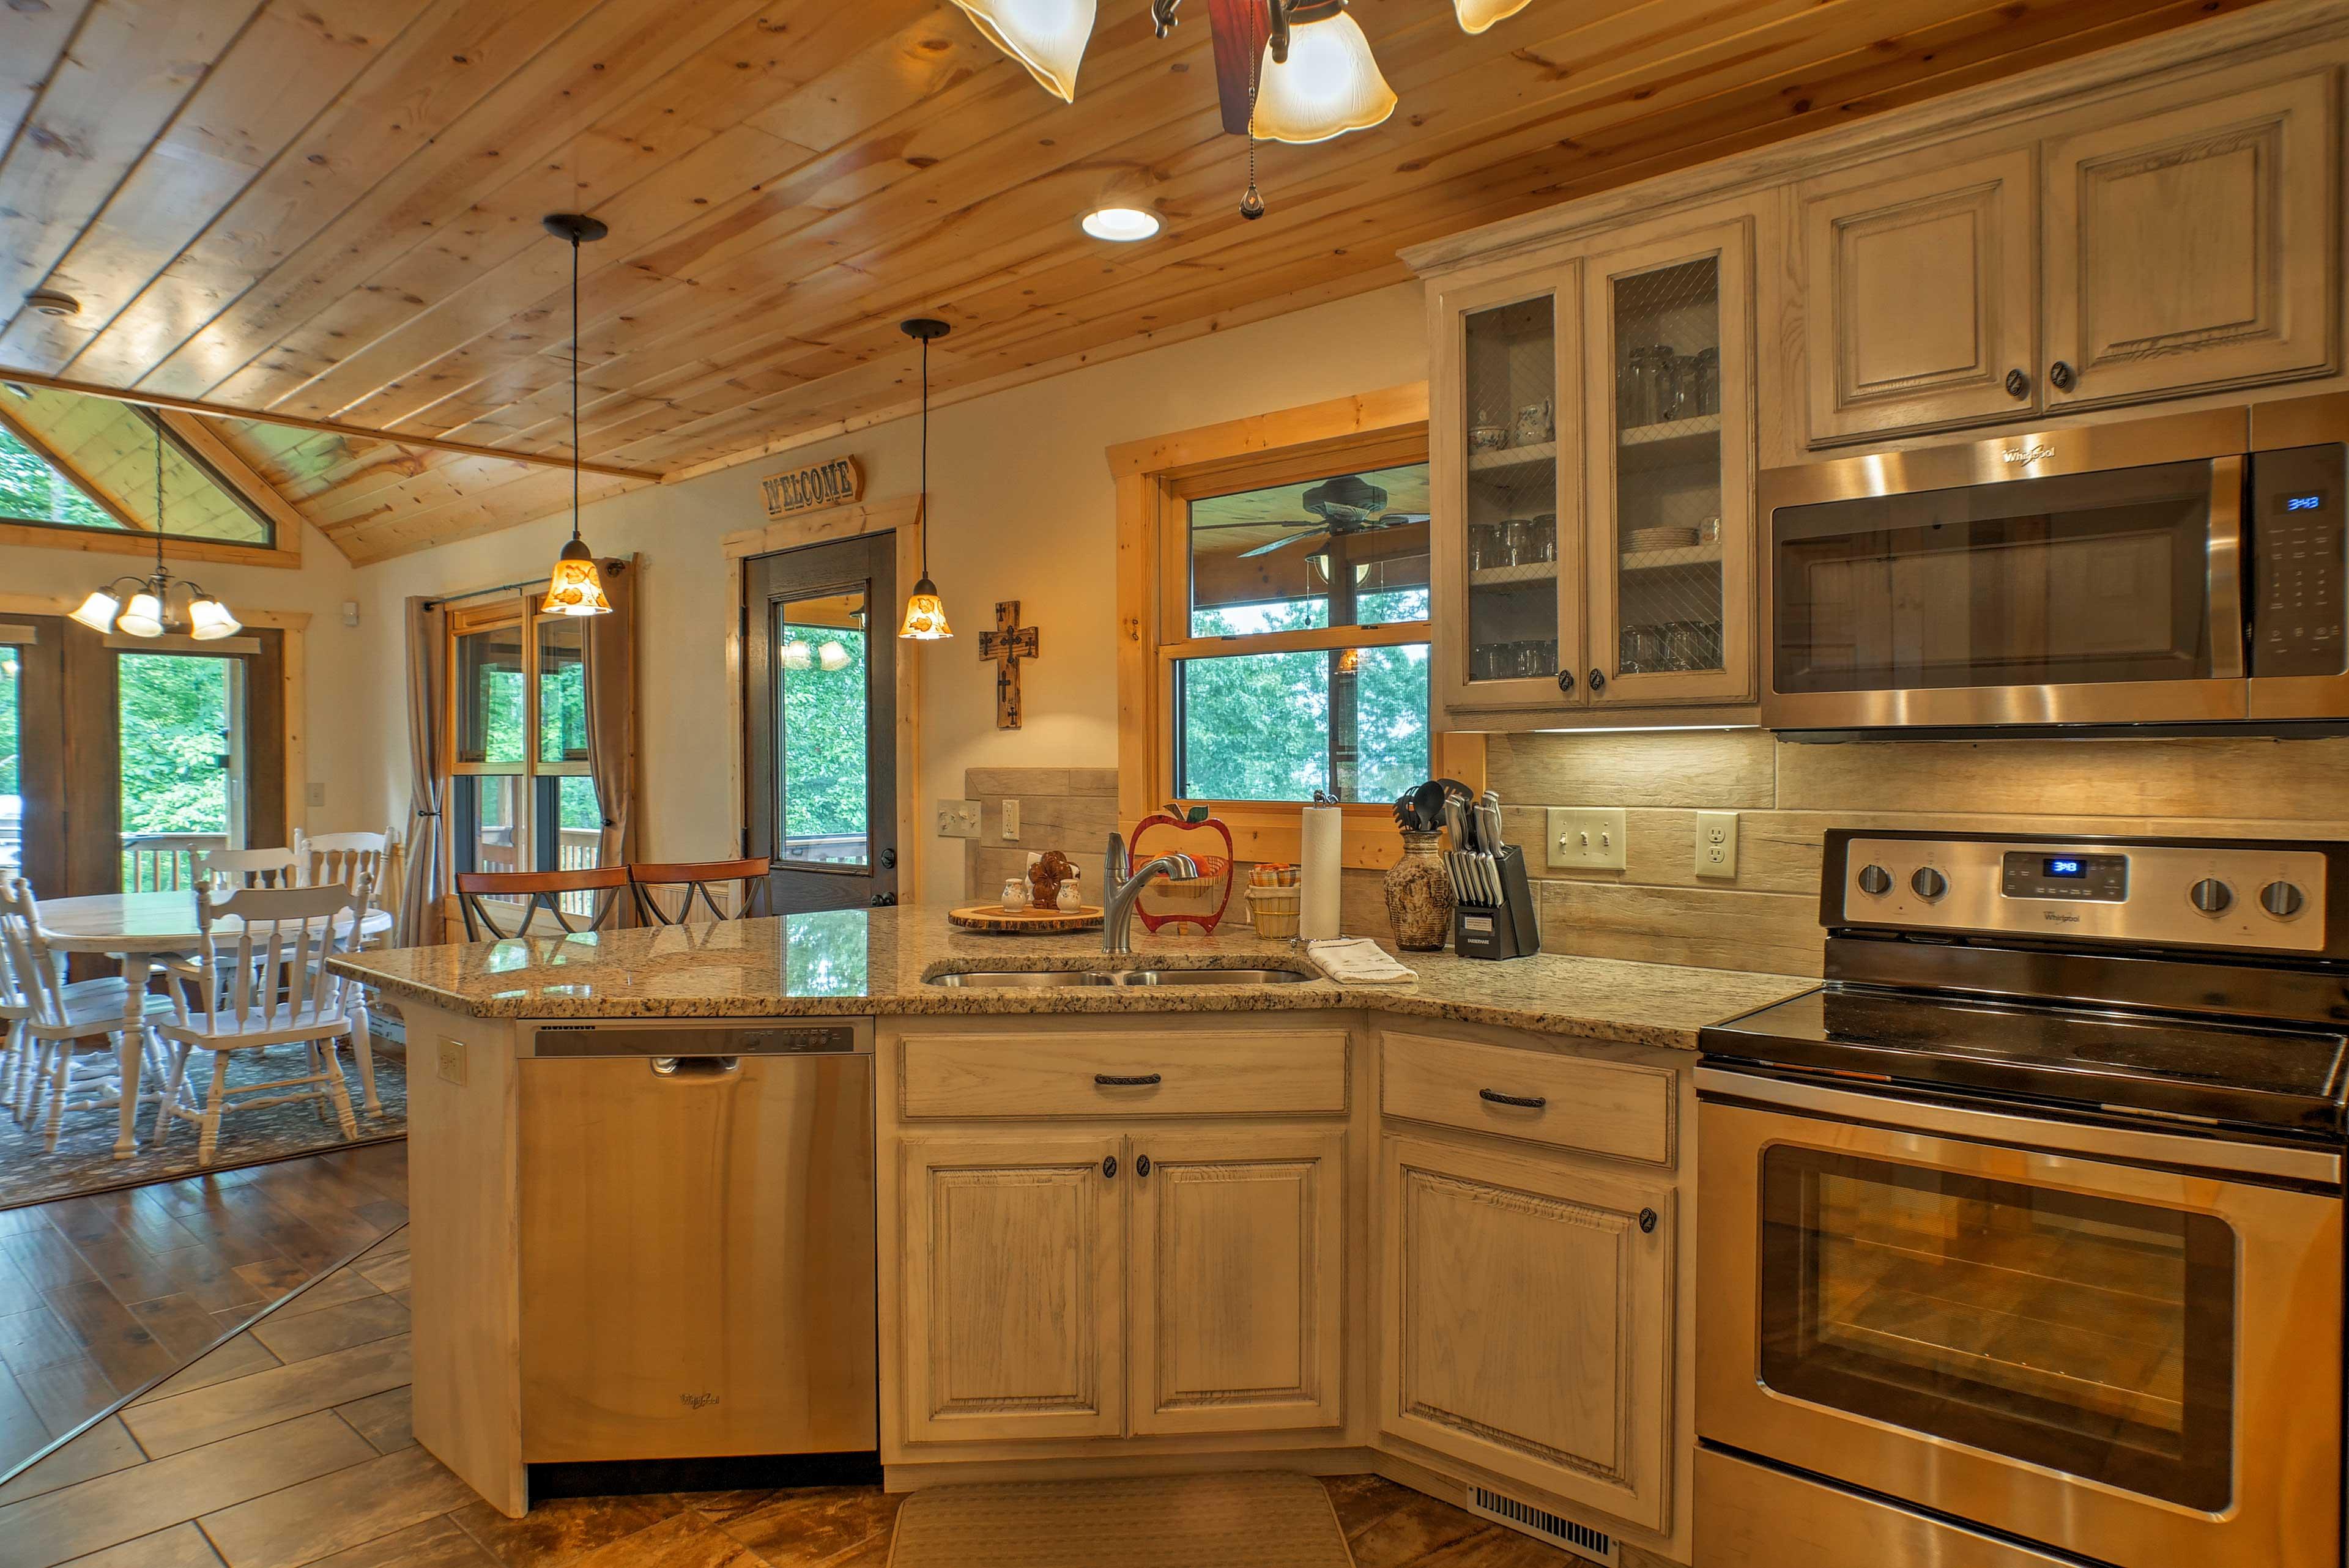 Effortlessly prepare meals using stainless steel appliances.